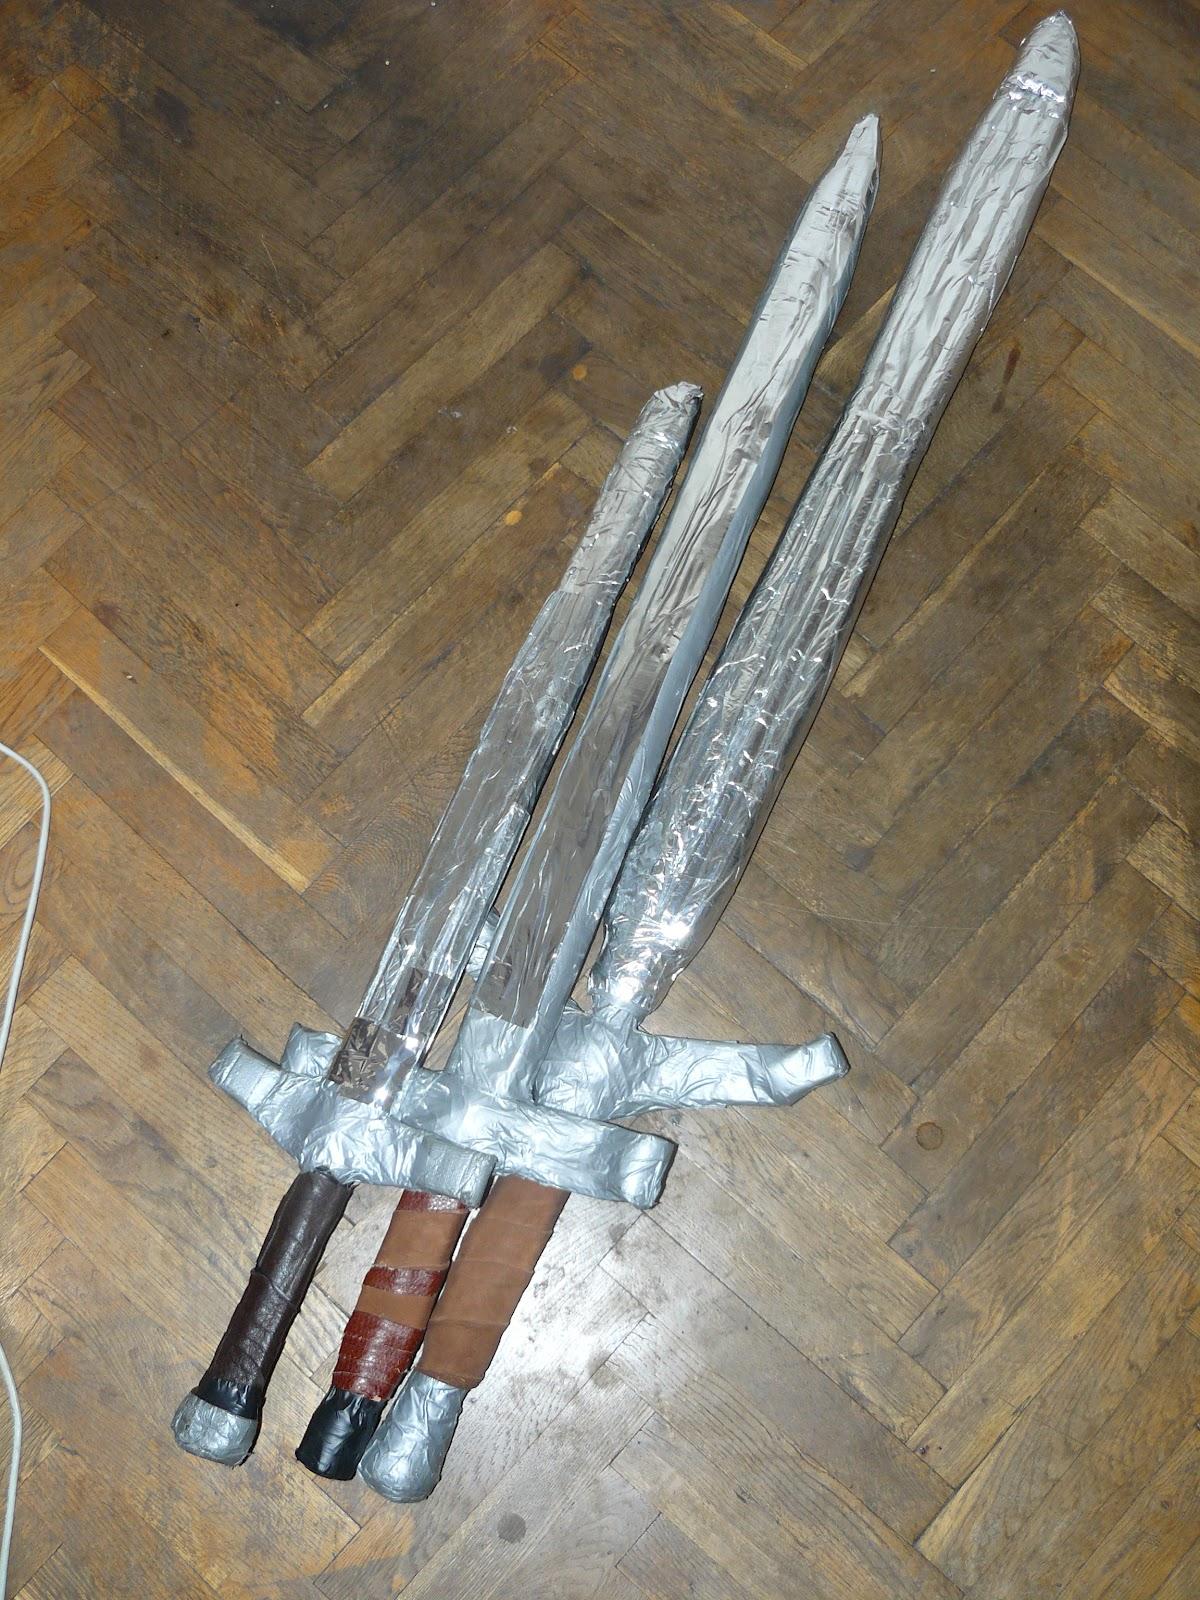 Buskador's LARP: How to make a larp boffer or hand and half ... on black sword designs, european sword designs, anime sword designs, hd sword designs, french sword designs, tattoo sword designs, korean sword designs, old sword designs, italian sword designs, amazing sword designs,